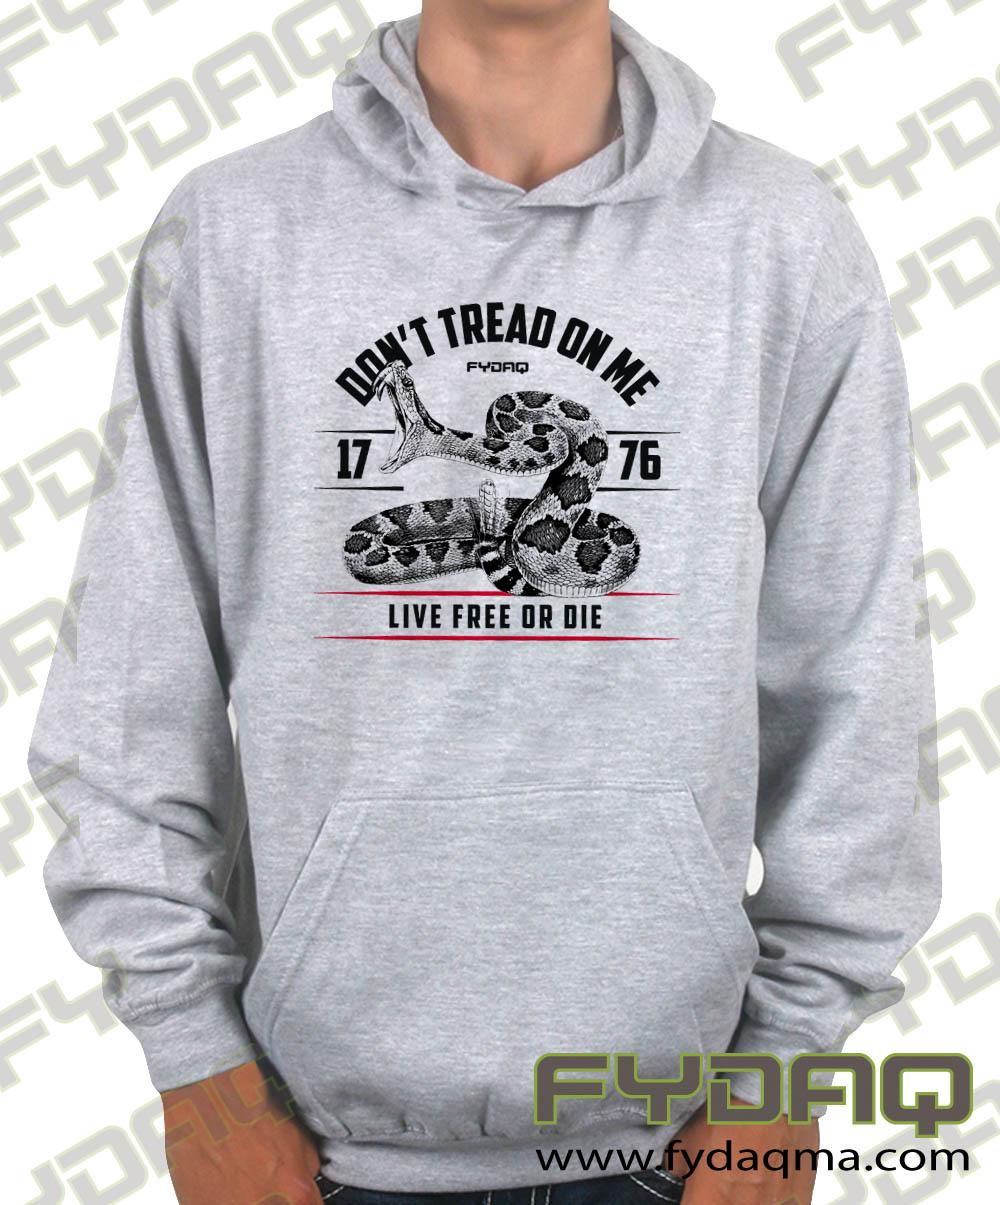 dont-tread-on-me-heather-grey-hoodie-fydaq